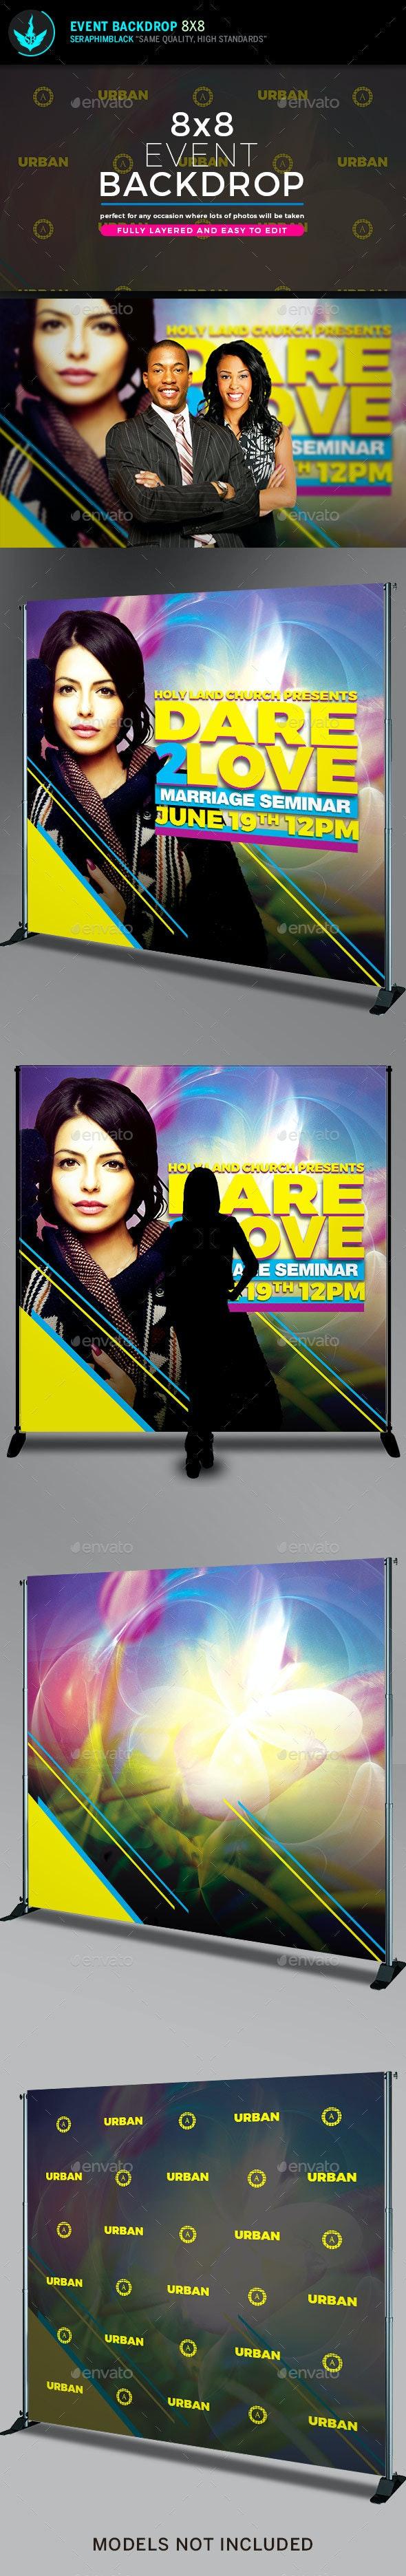 Dare 2 Love 8x8 Backdrop Template - Signage Print Templates